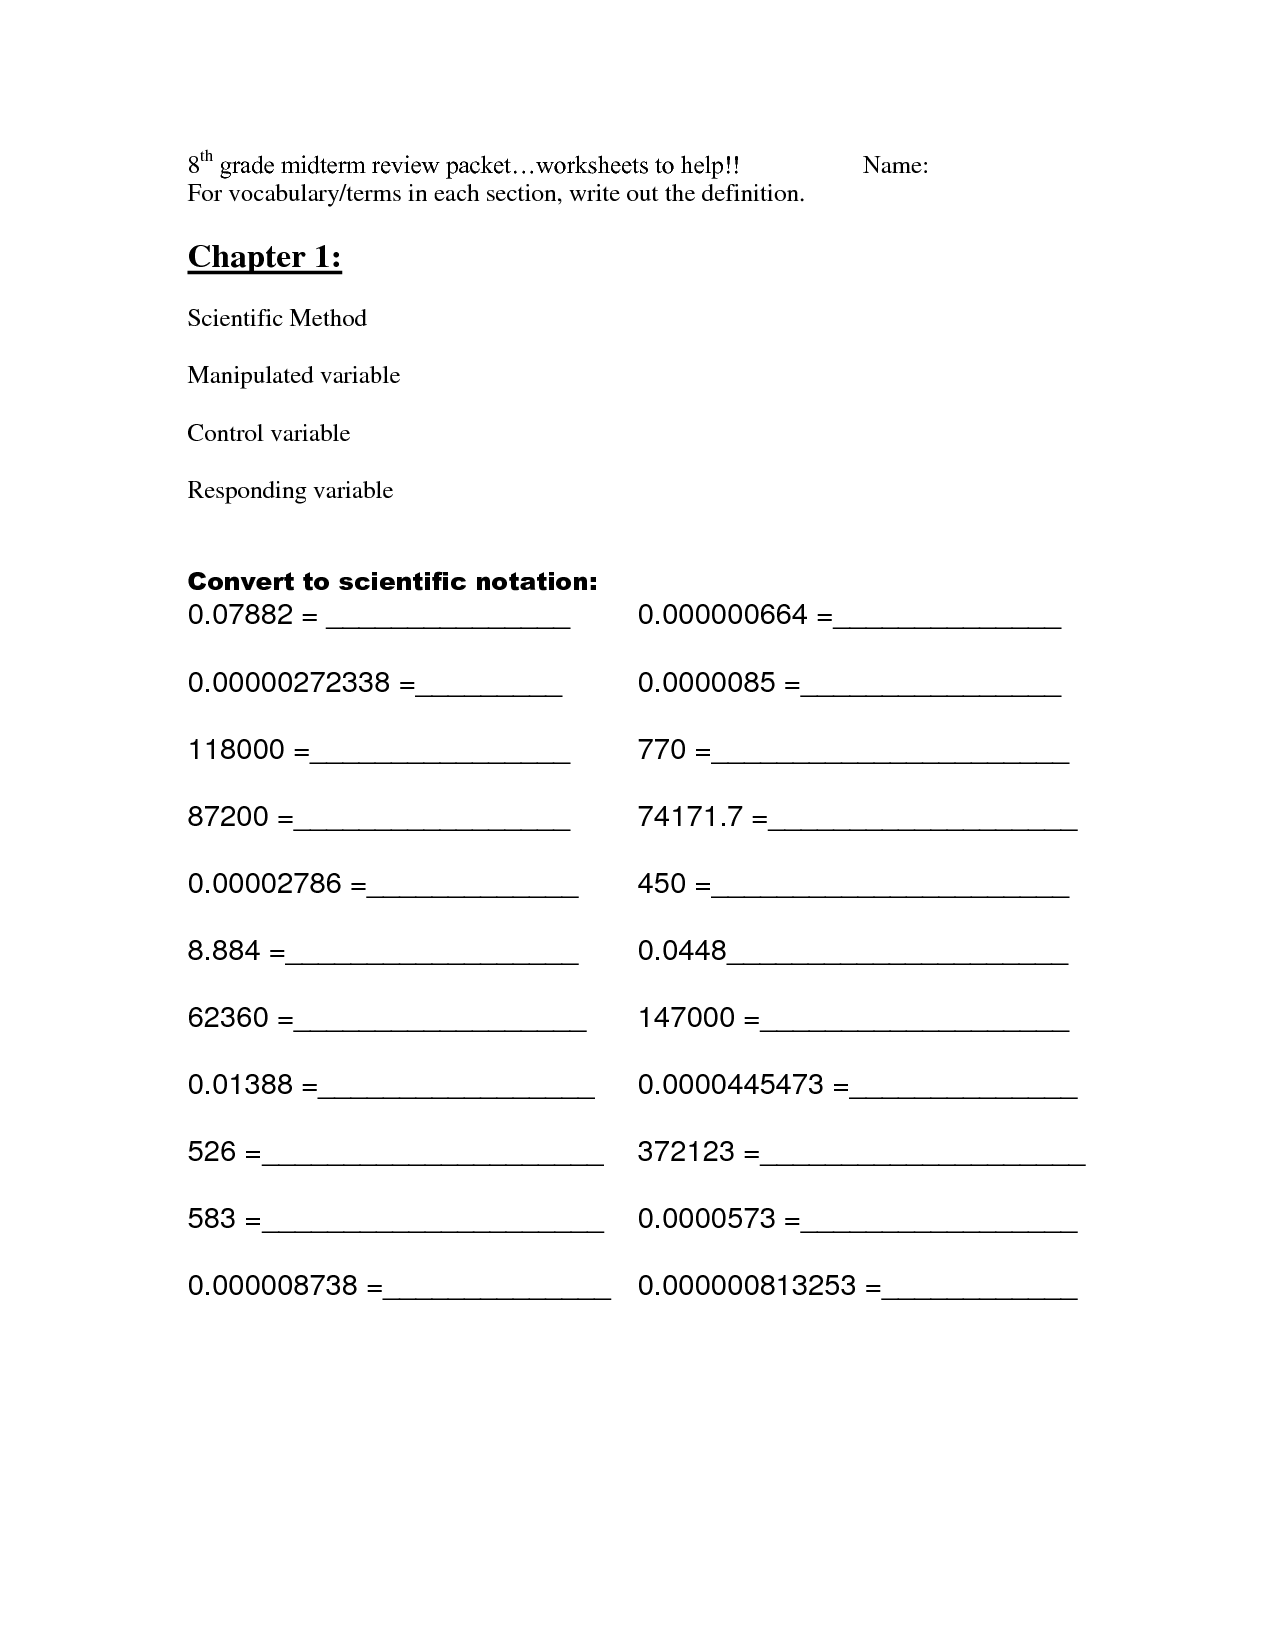 Vocabulary Worksheet For Grade 8